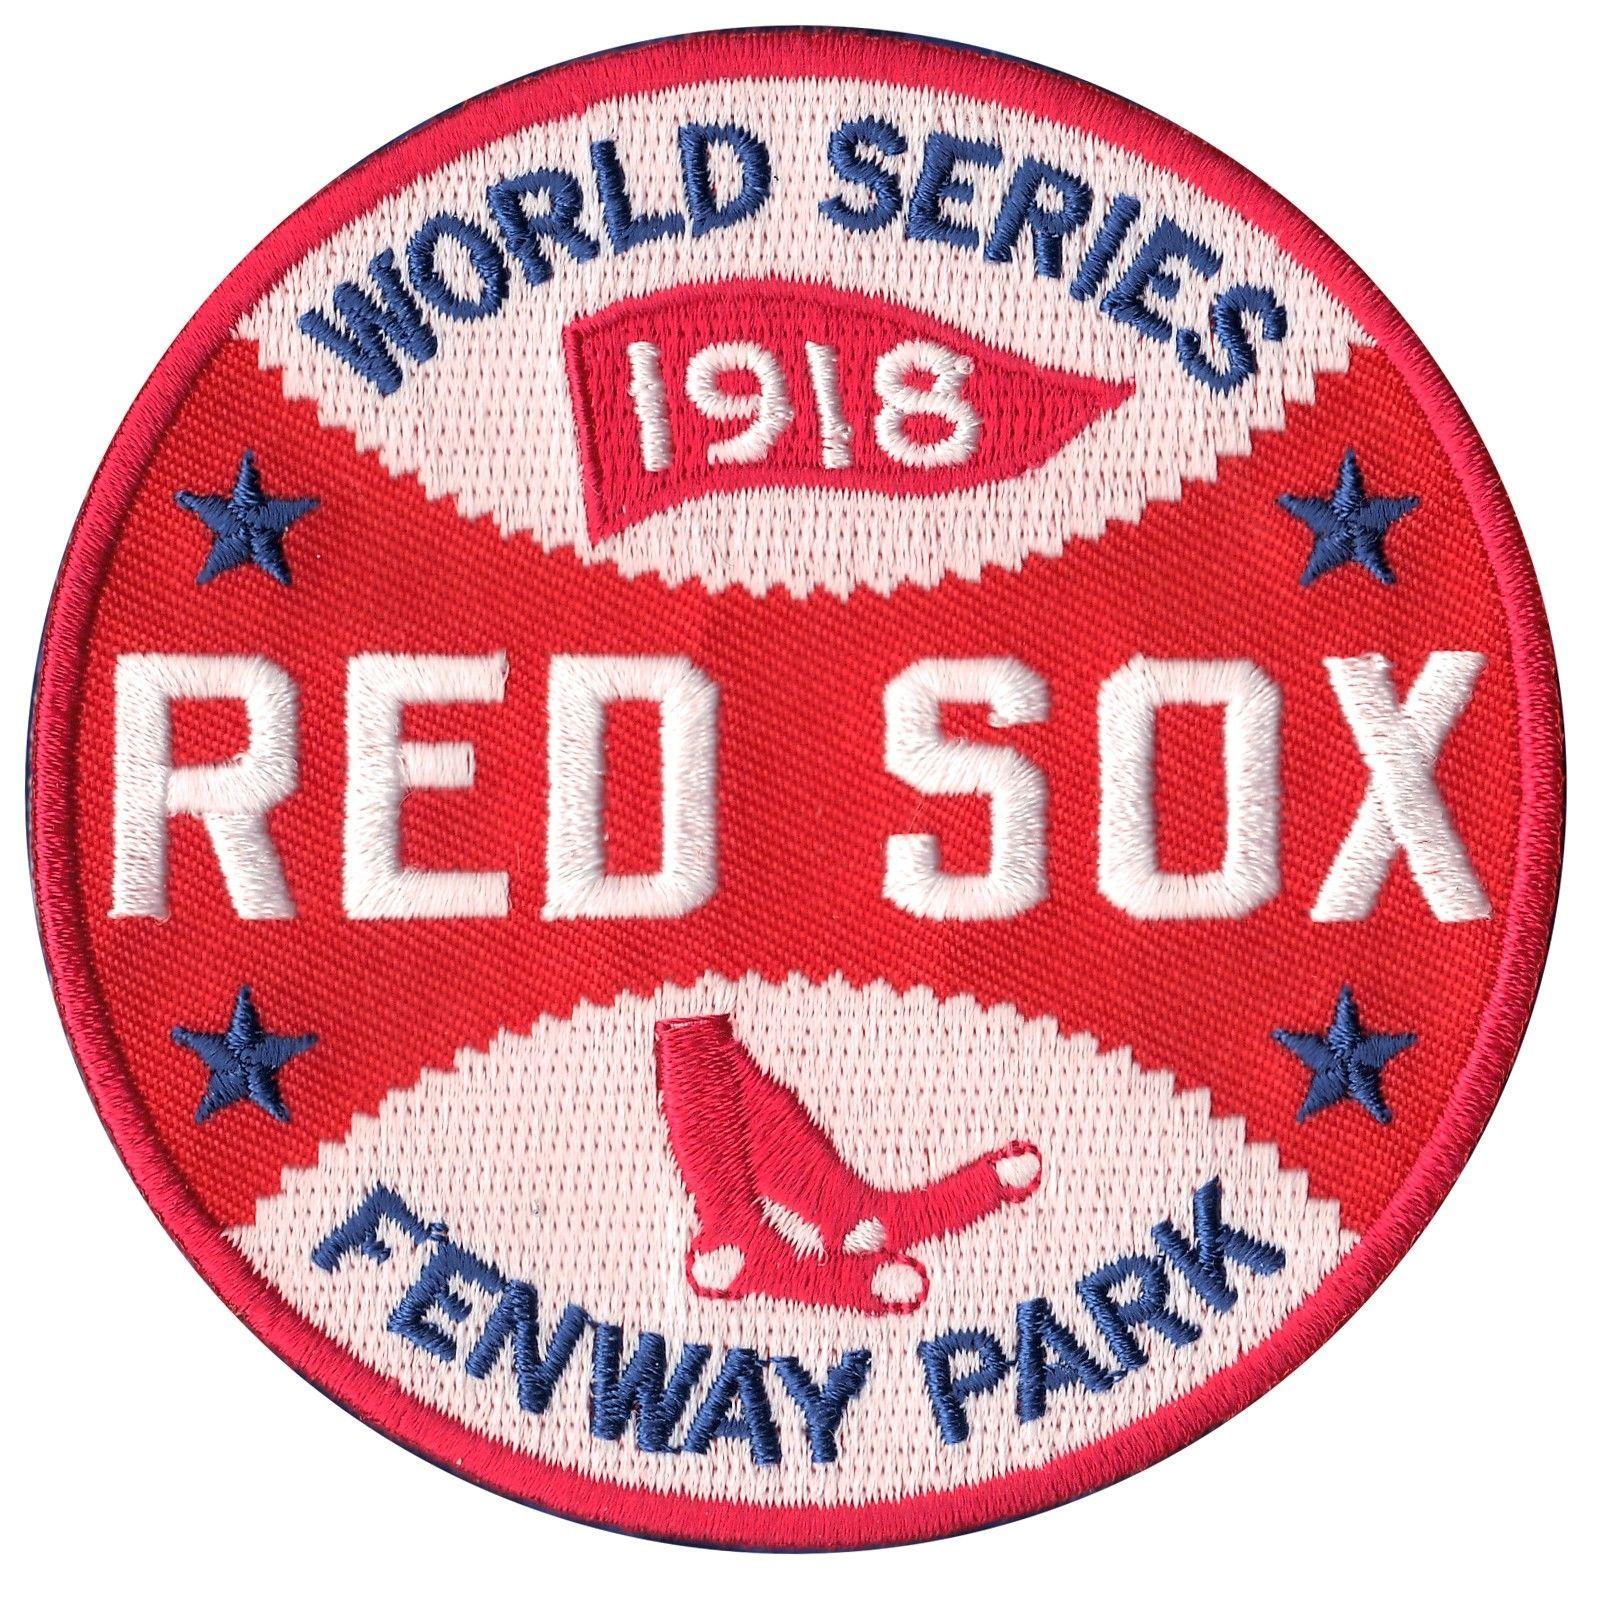 1918 Boston Red Sox Mlb World Series Team Champions Logo Jersey Sleeve Patch 813300010958 Ebay Boston Red Sox Logo Boston Red Sox Wallpaper Red Sox Wallpaper